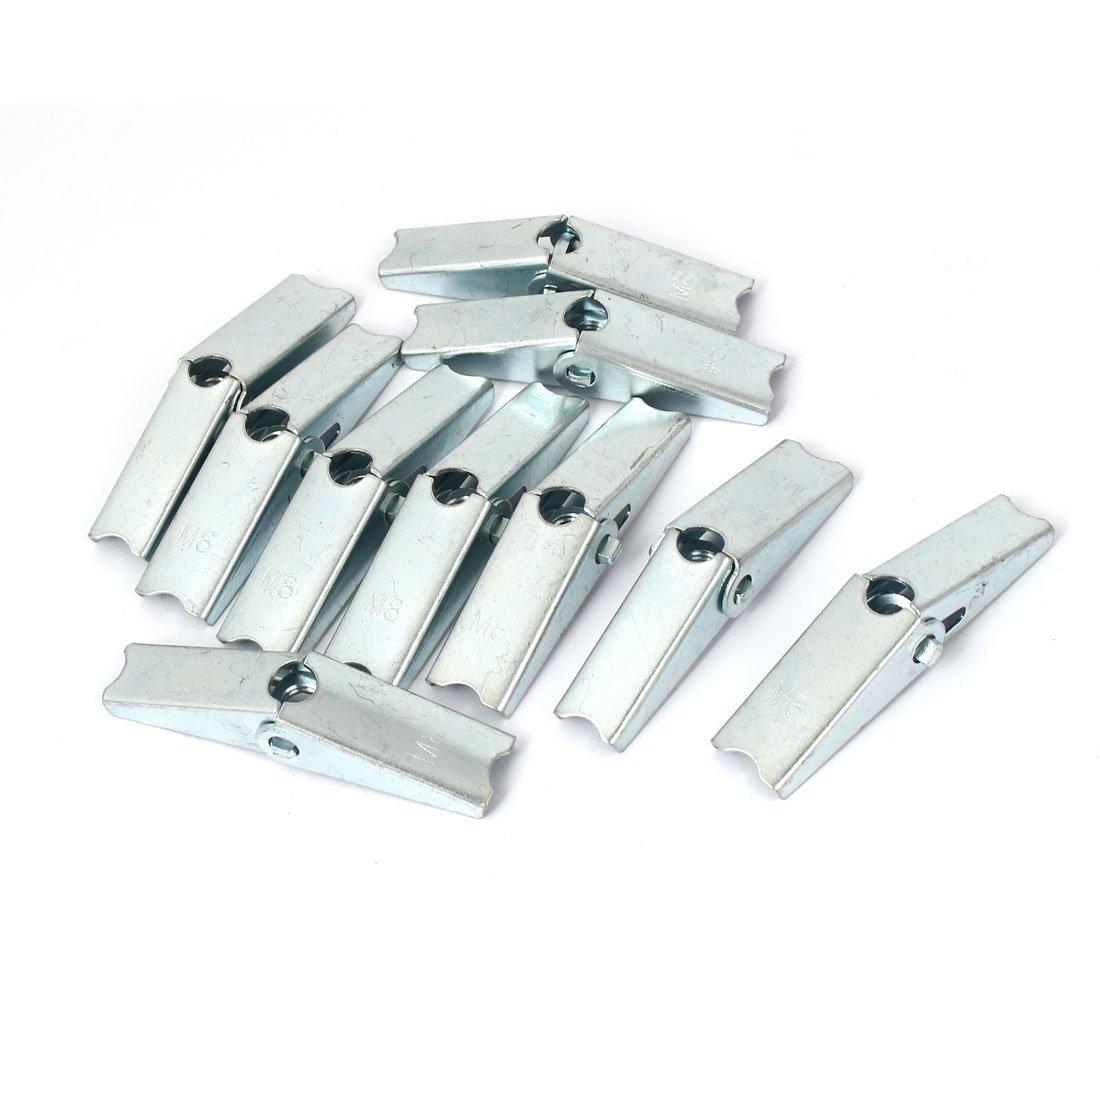 110V Fuser Altru Print CE731A-MK-DLX-AP Includes RM1-7395 Transfer Roller /& Tray 1-5 Rollers CE502-67909 Deluxe Maintenance Kit for HP Laserjet Enterprise M4555 CE731-67901, CE502-67909